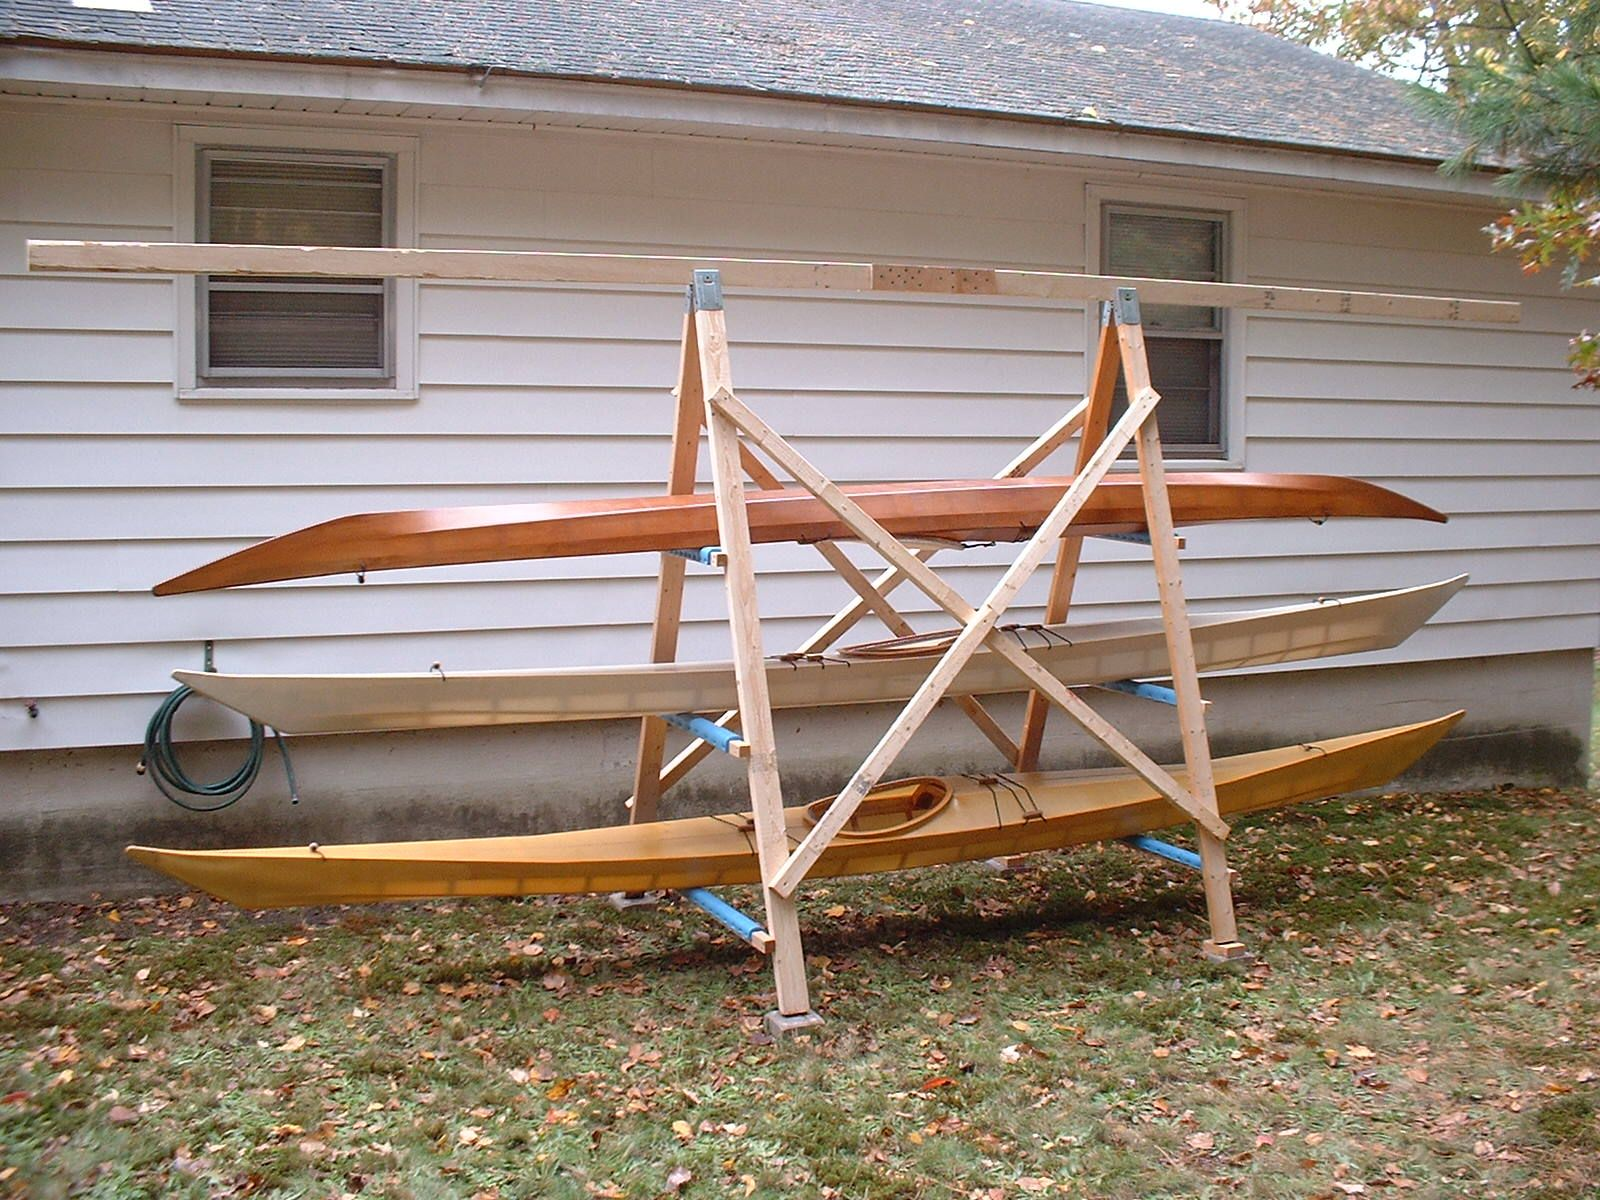 A Simple A Frame Kayak Storage Rack Briannystrom Com Kayak Storage Rack Kayak Storage Canoe Storage Diy backyard kayak rack